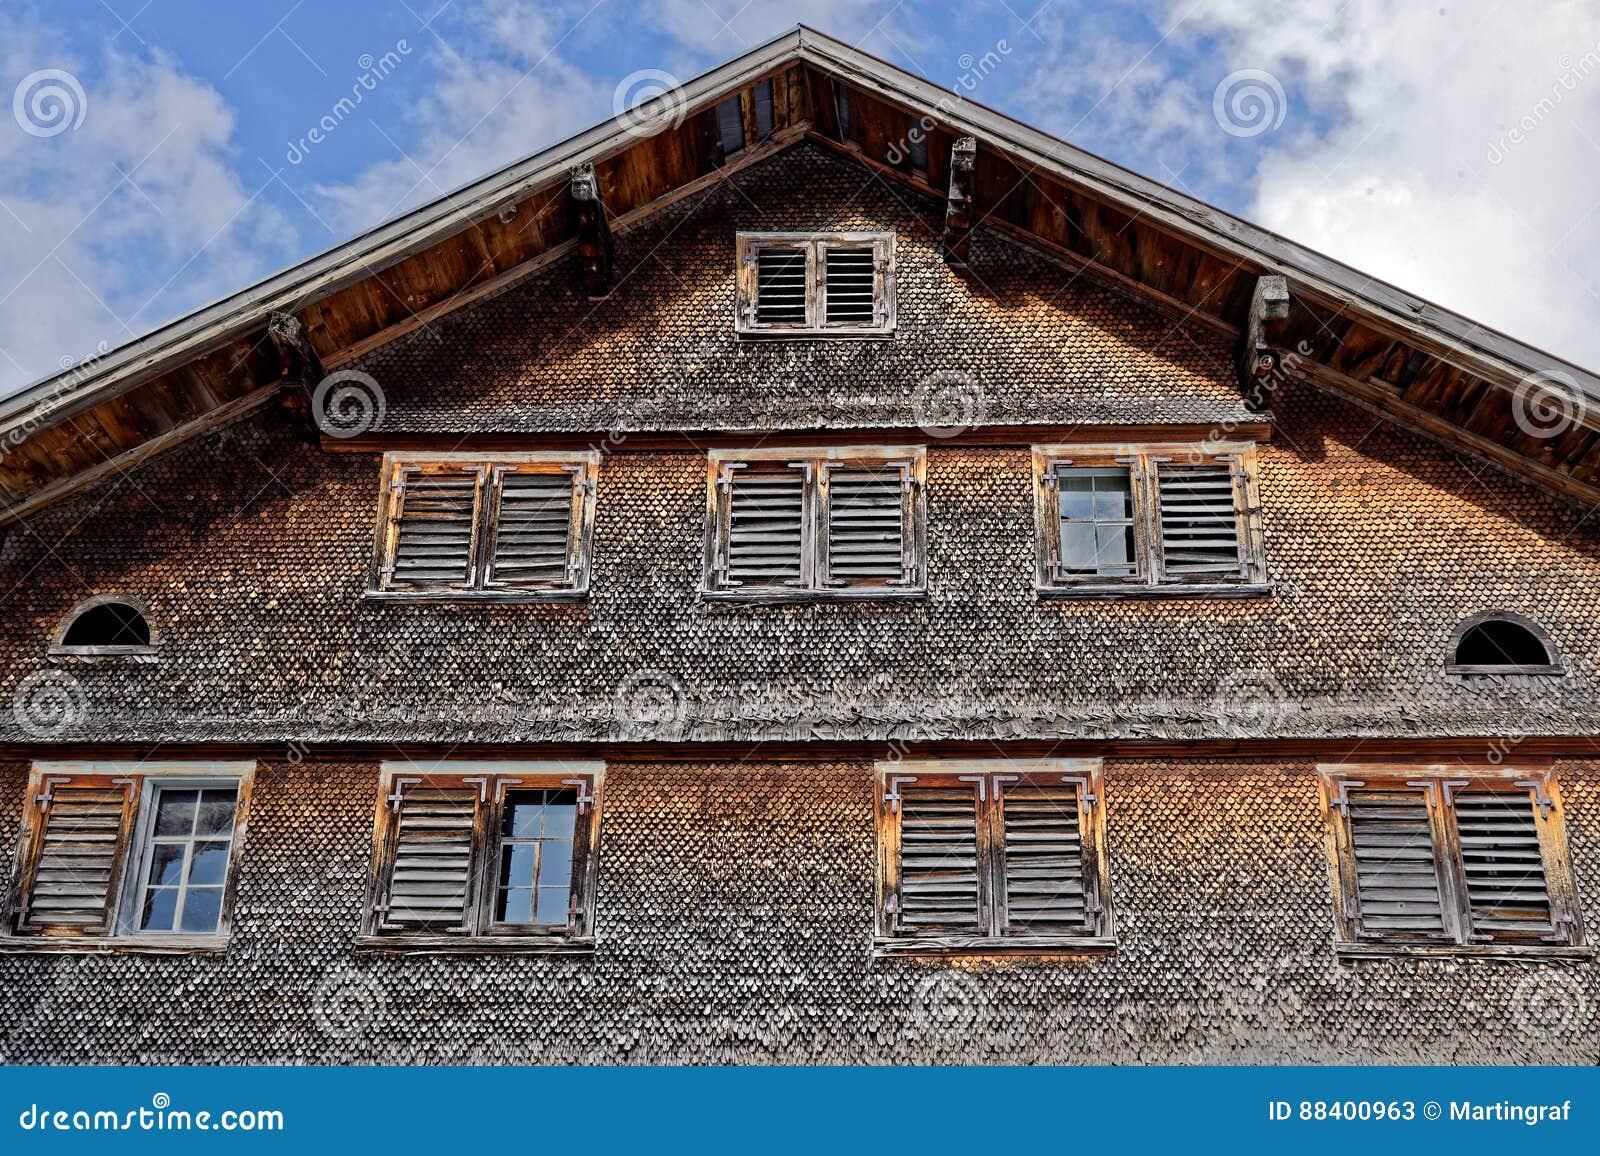 Weathered shingle house facade